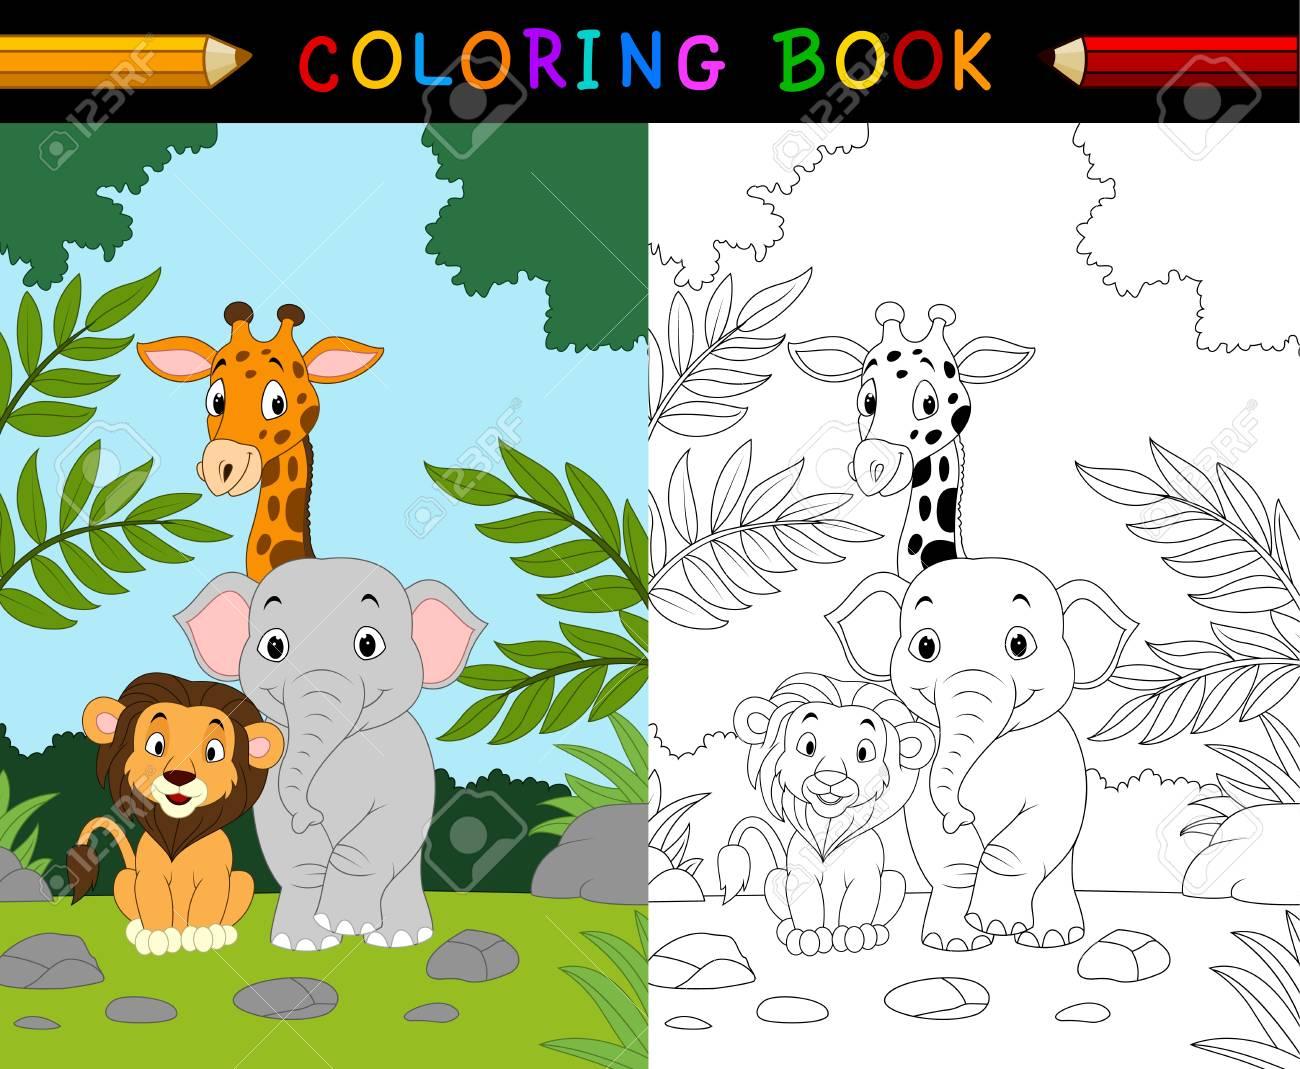 Illustration Of Cartoon Safari Animal Coloring Book Royalty Free ...